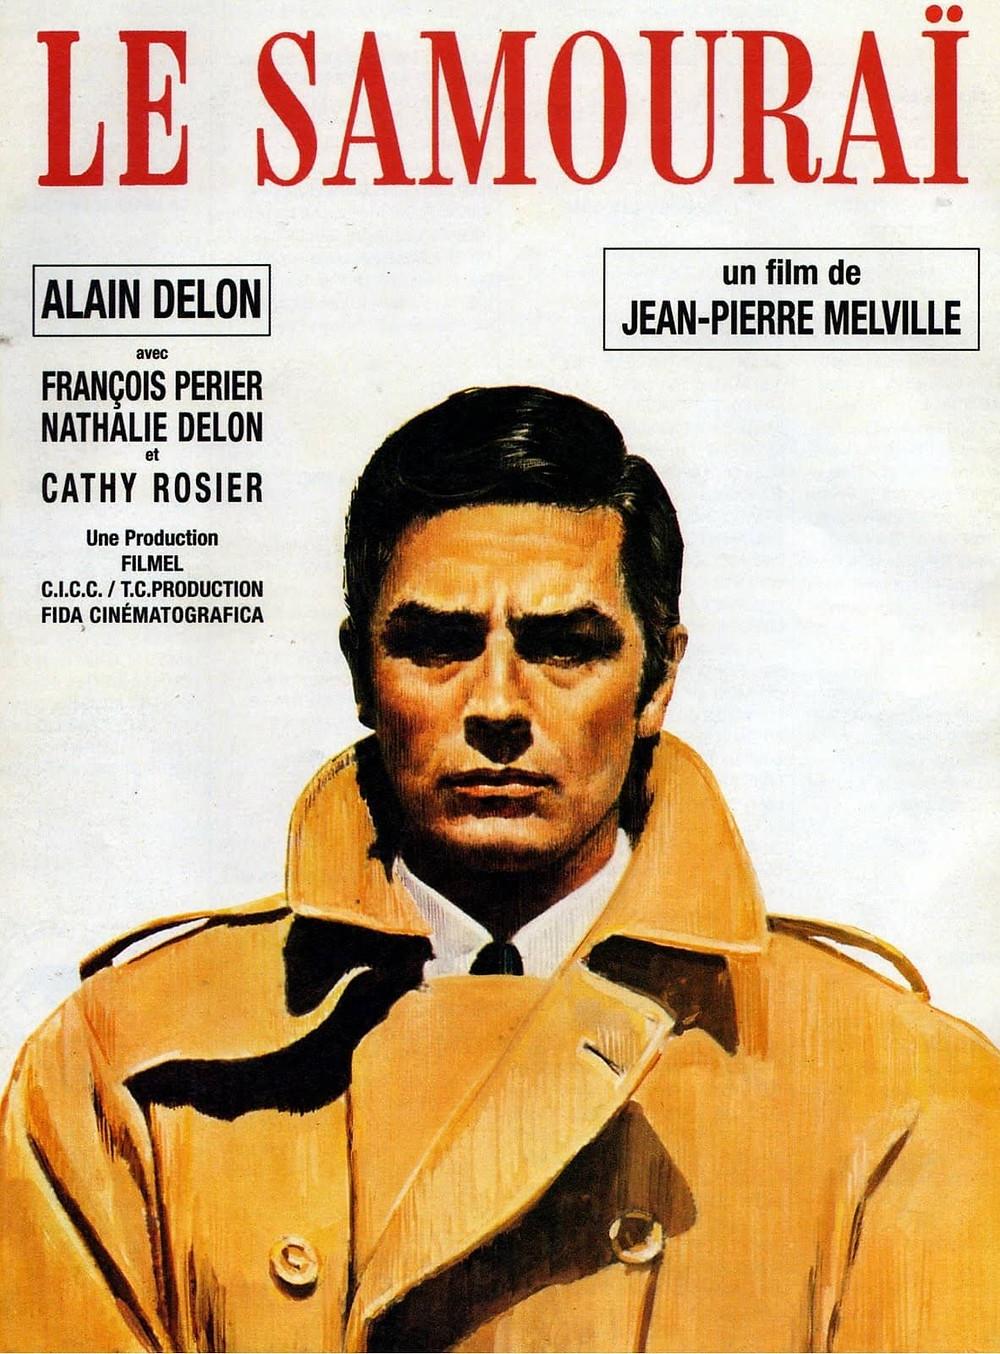 recenzie Le Samourai Alain Delon